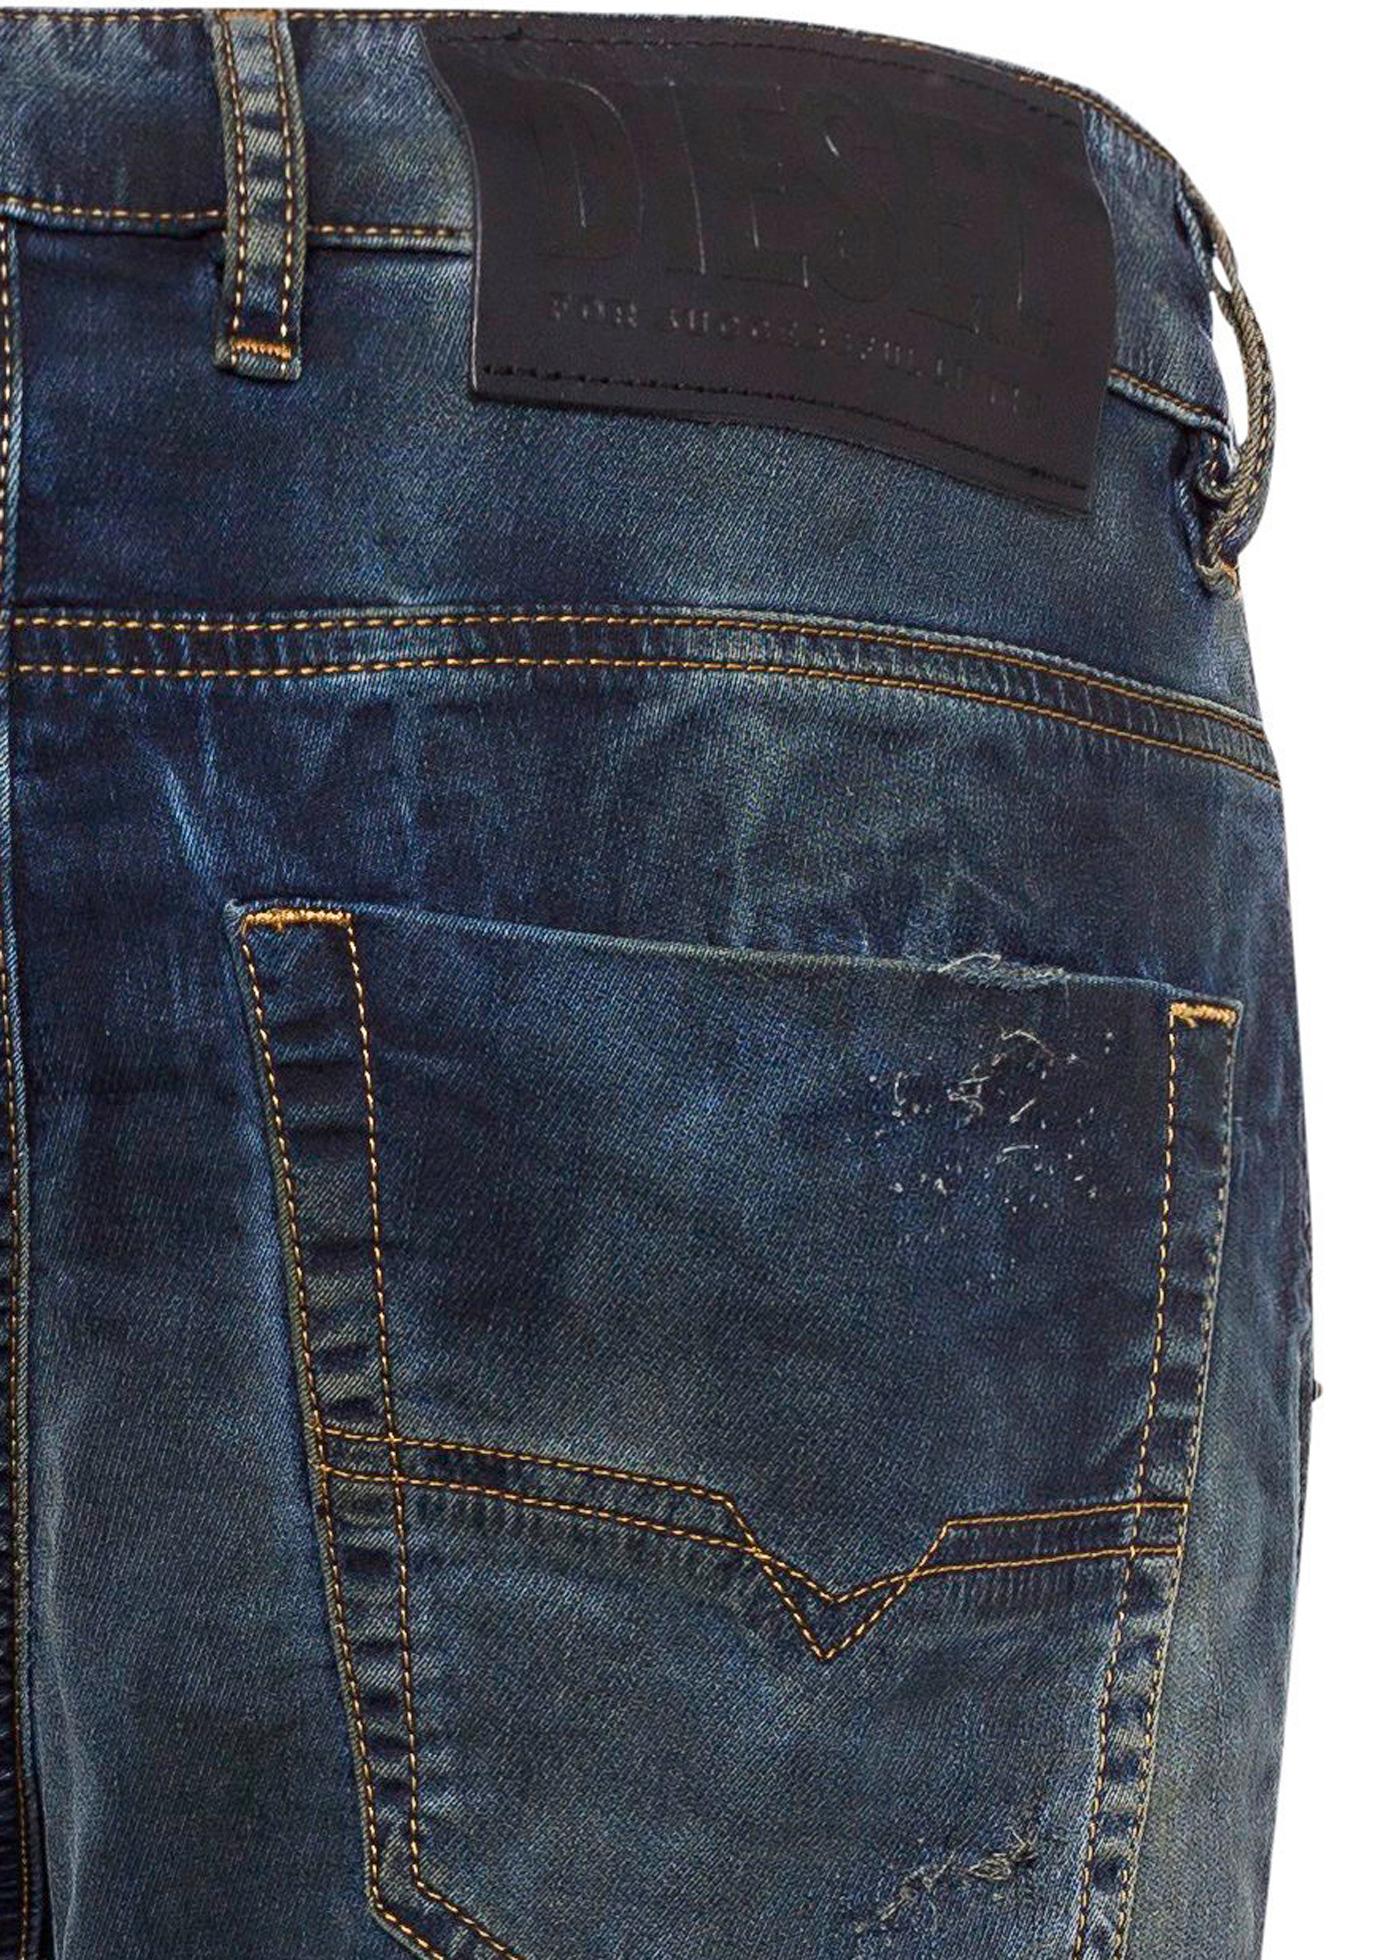 KROOLEY-Y-NE L.32 Sweat jeans image number 3